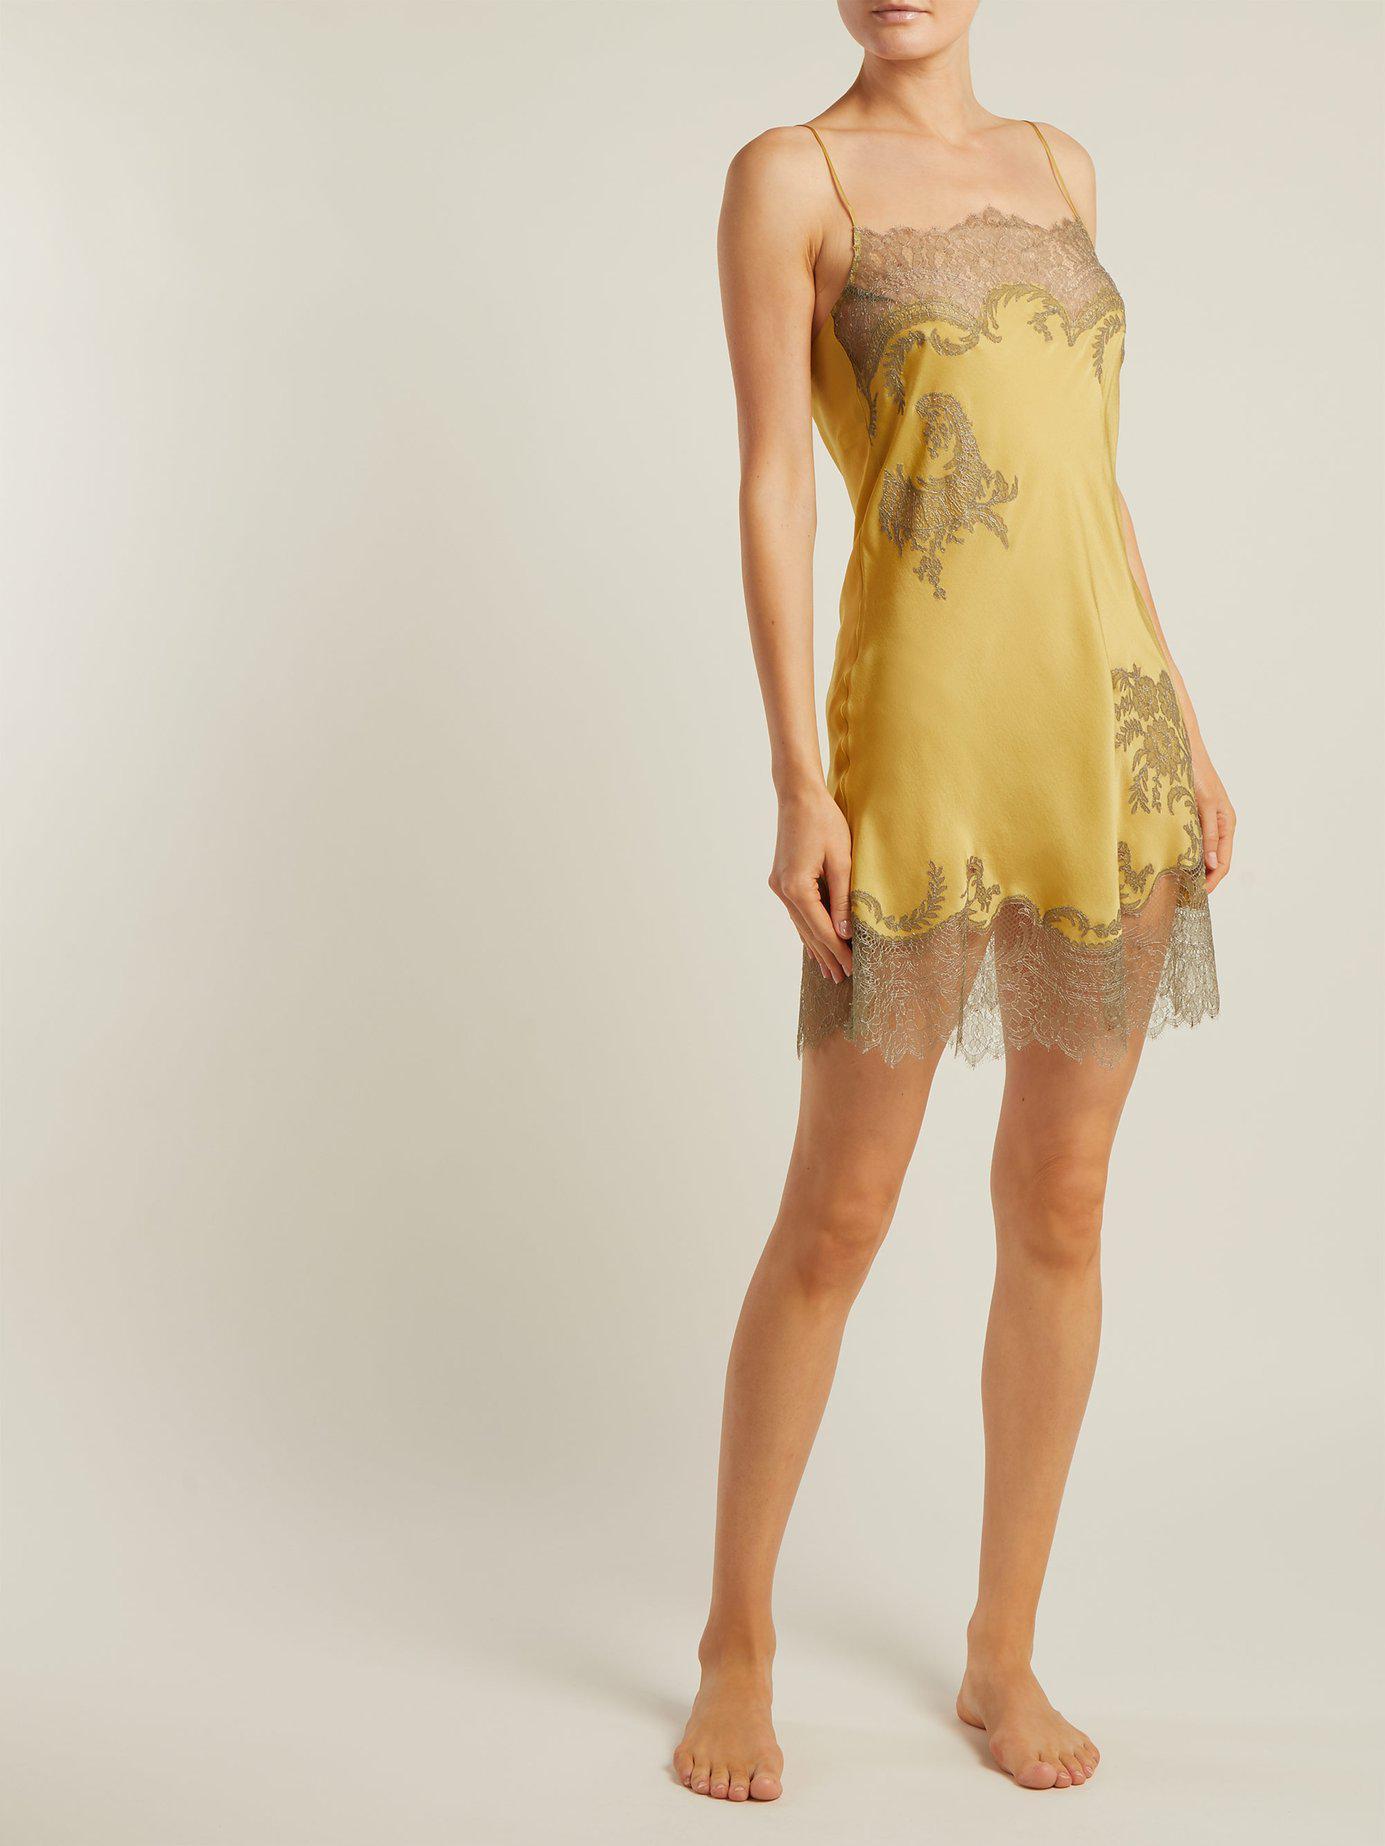 45e03f0a3584 Lyst - Carine Gilson Lace Trimmed Silk Satin Slip Dress in Yellow